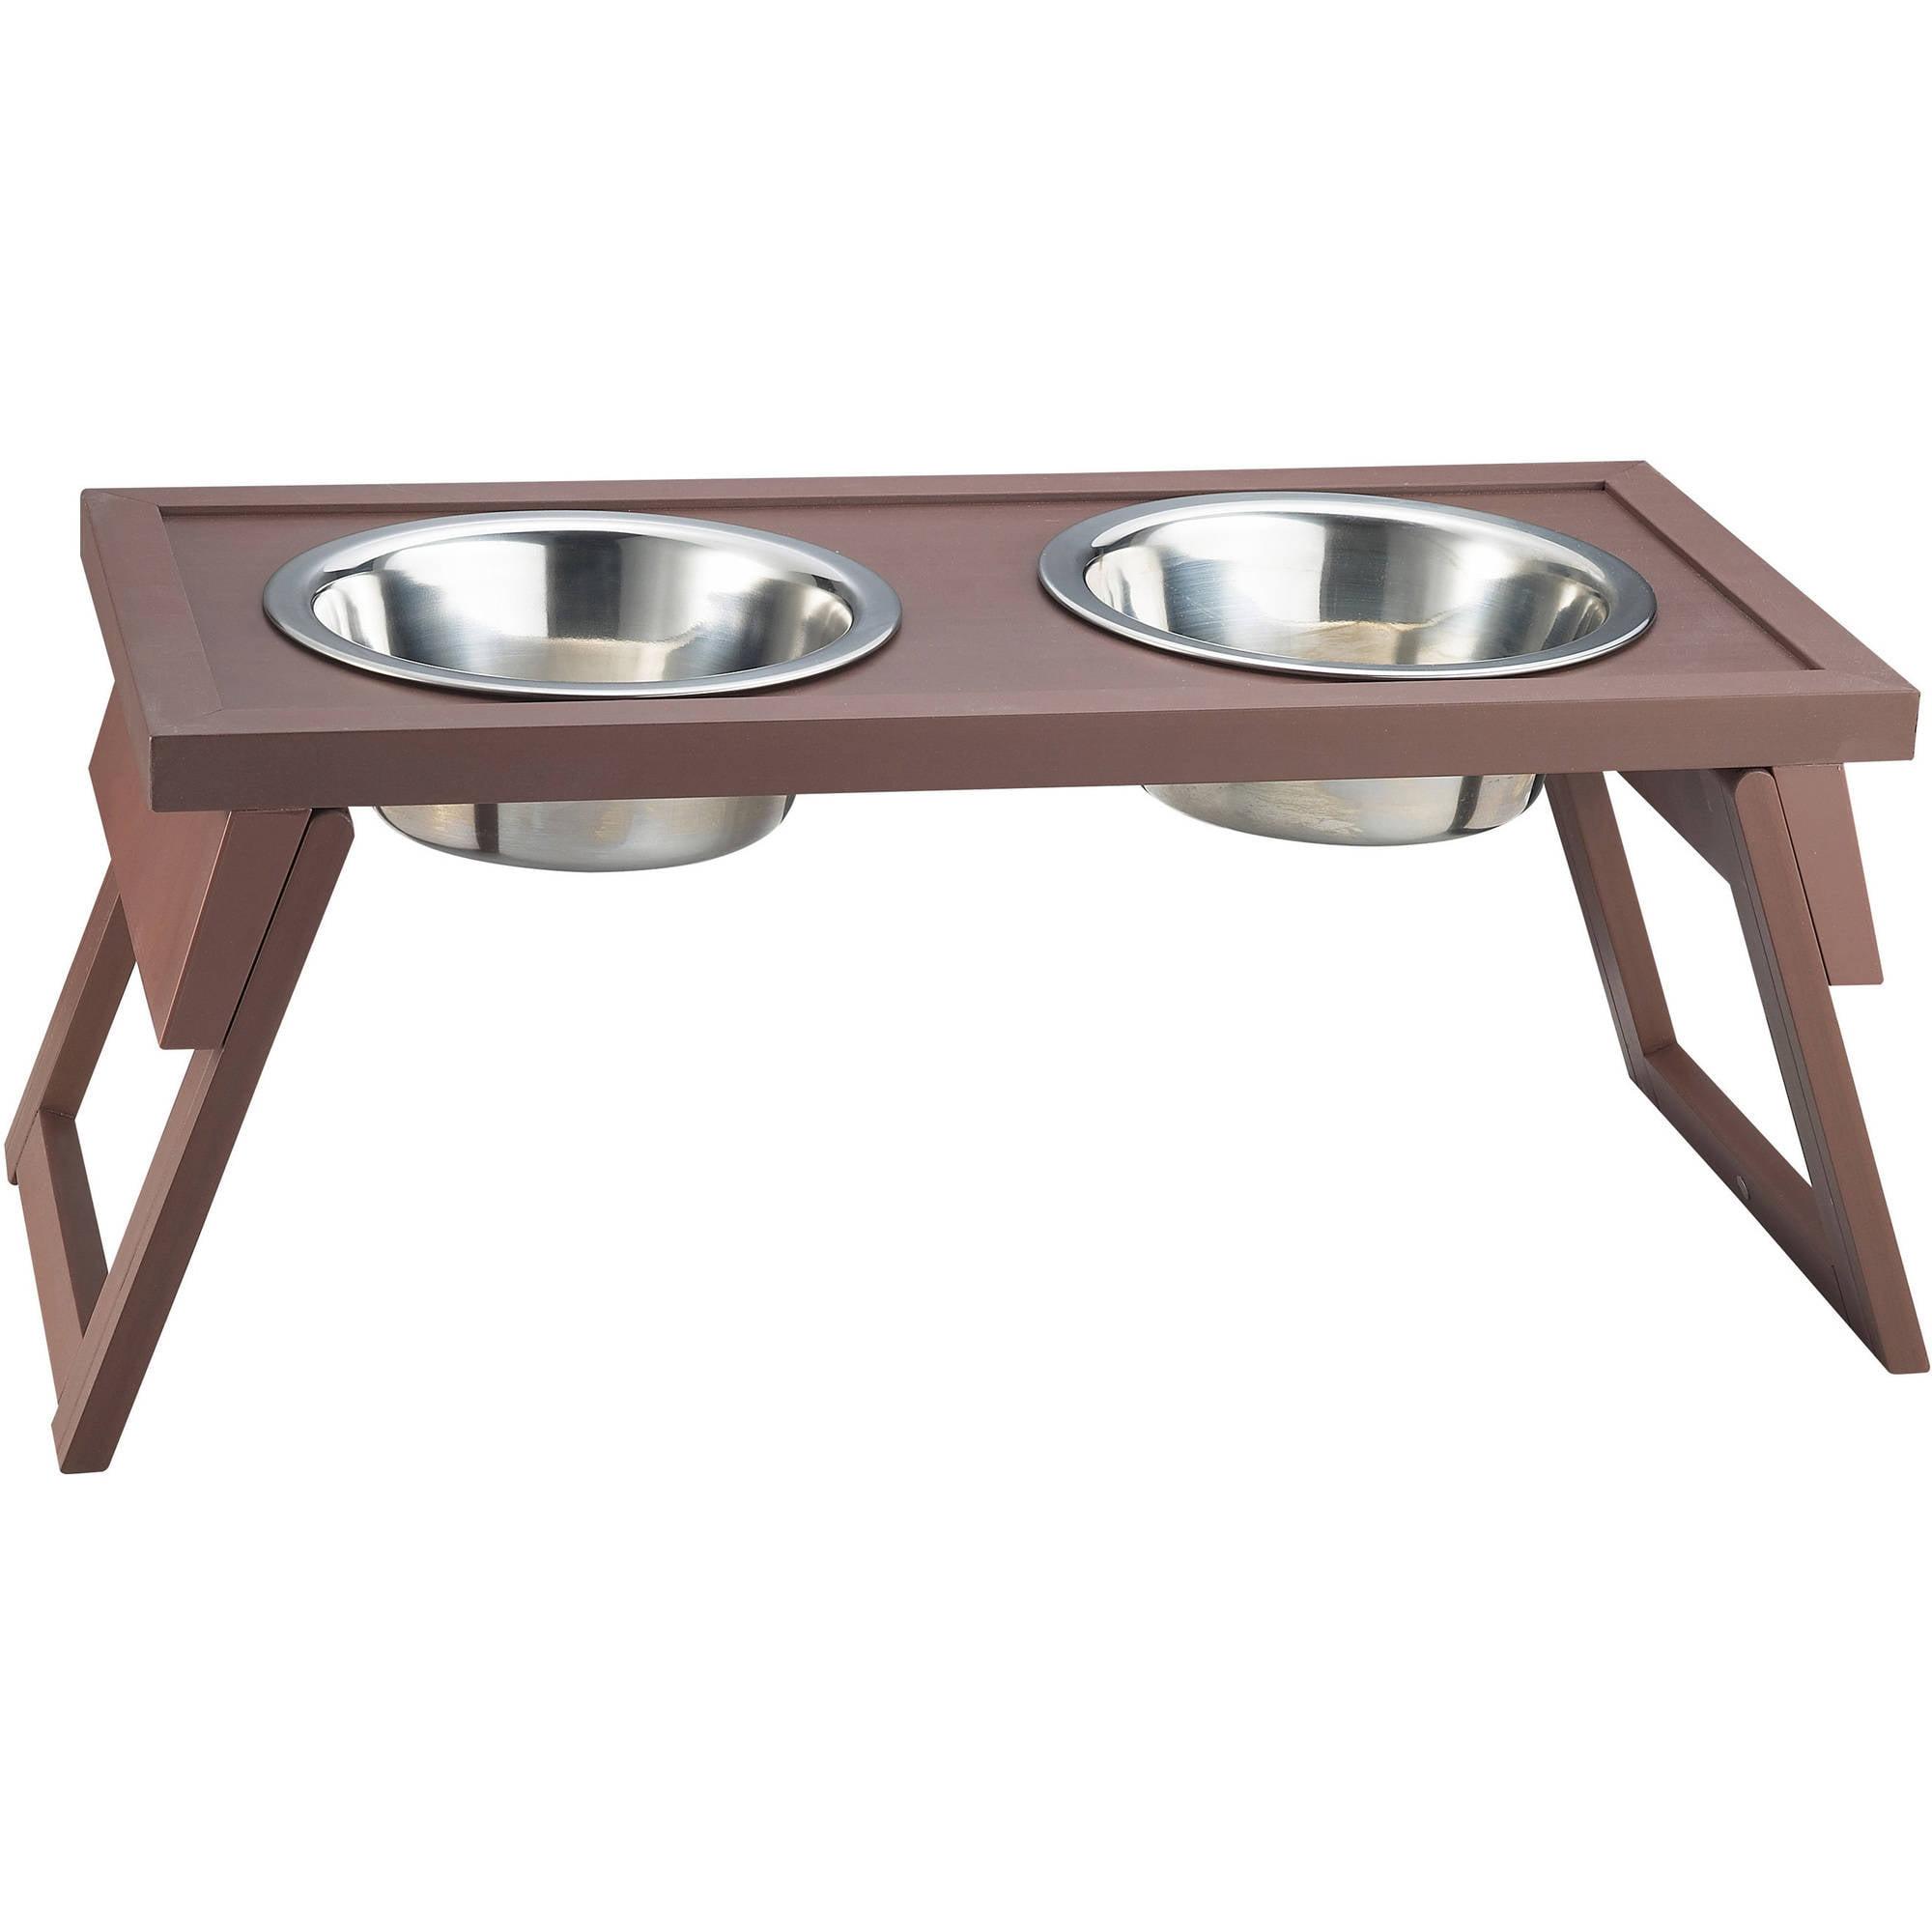 New Age Pet Habitat 'n Home HiLo Diner Raised Dog Bowl, Medium, Russet